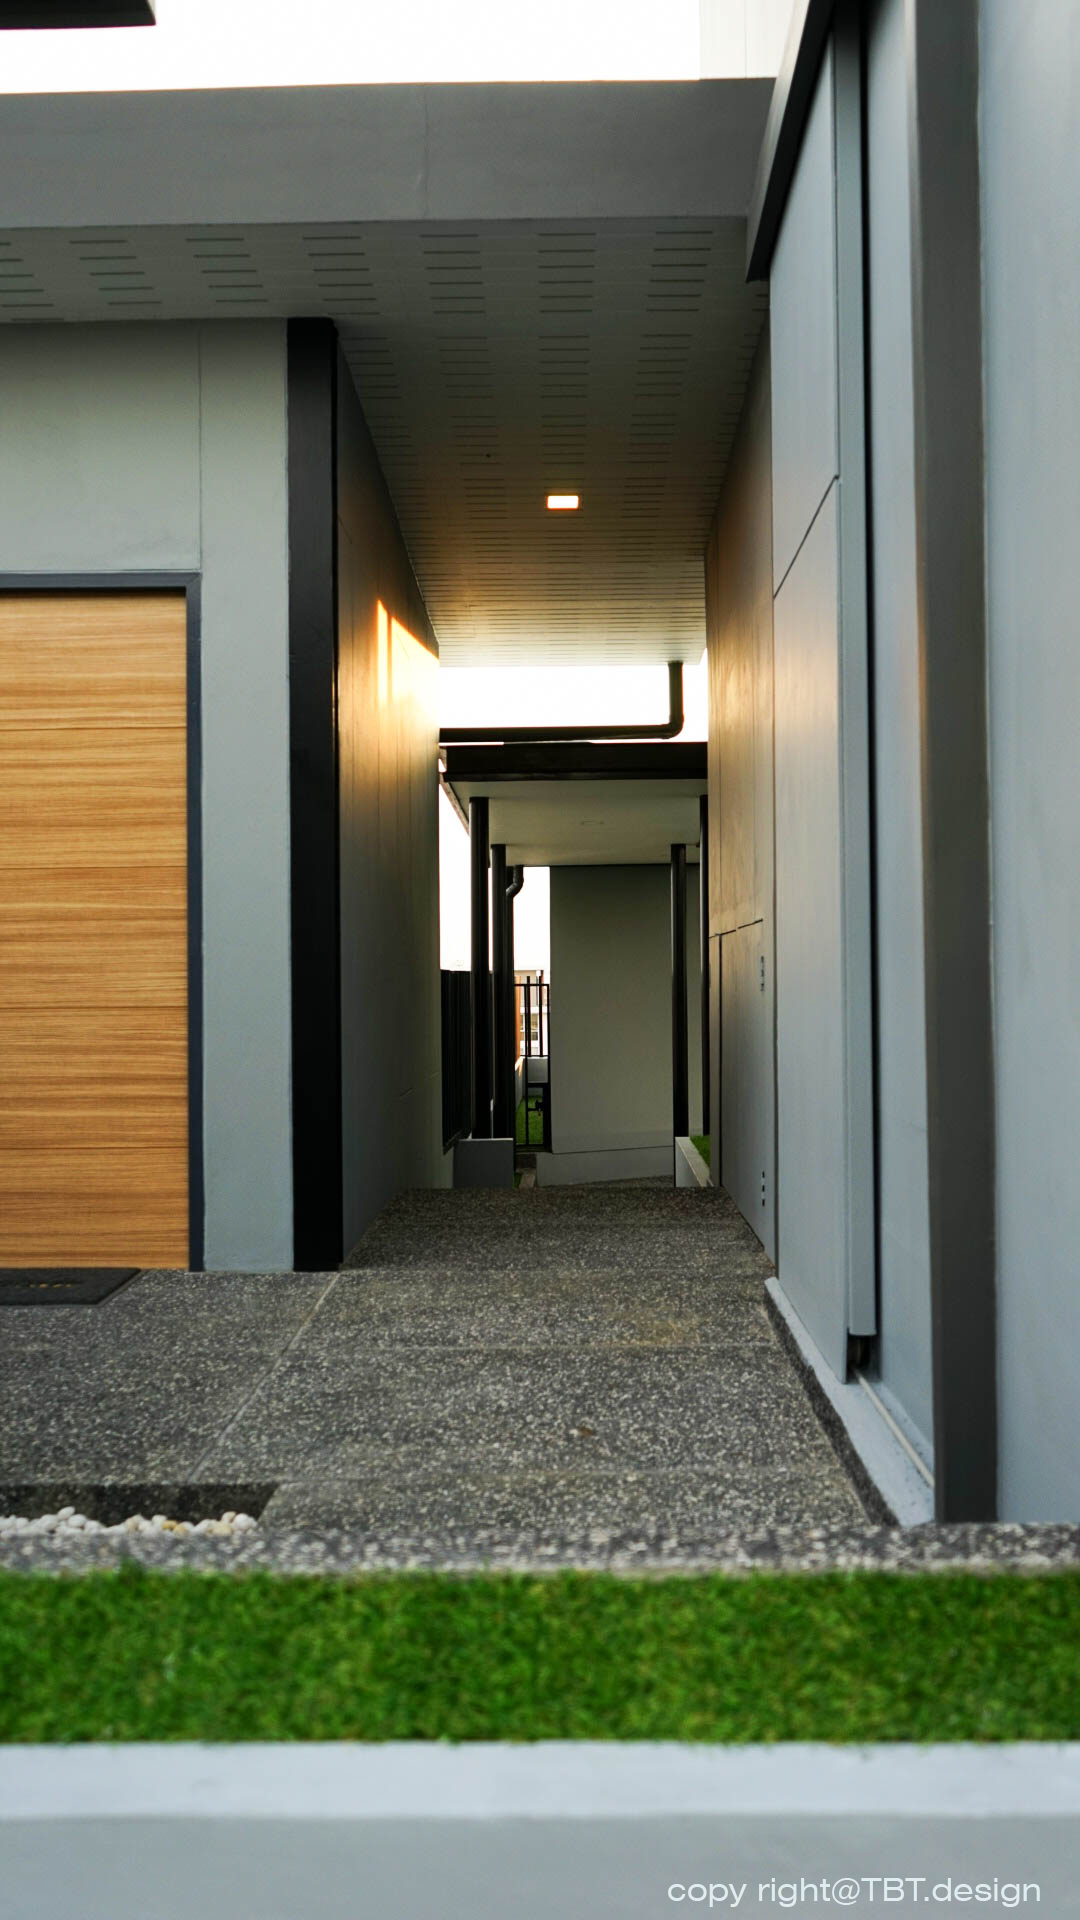 TBT-DAF landscape architecture design de botan 24